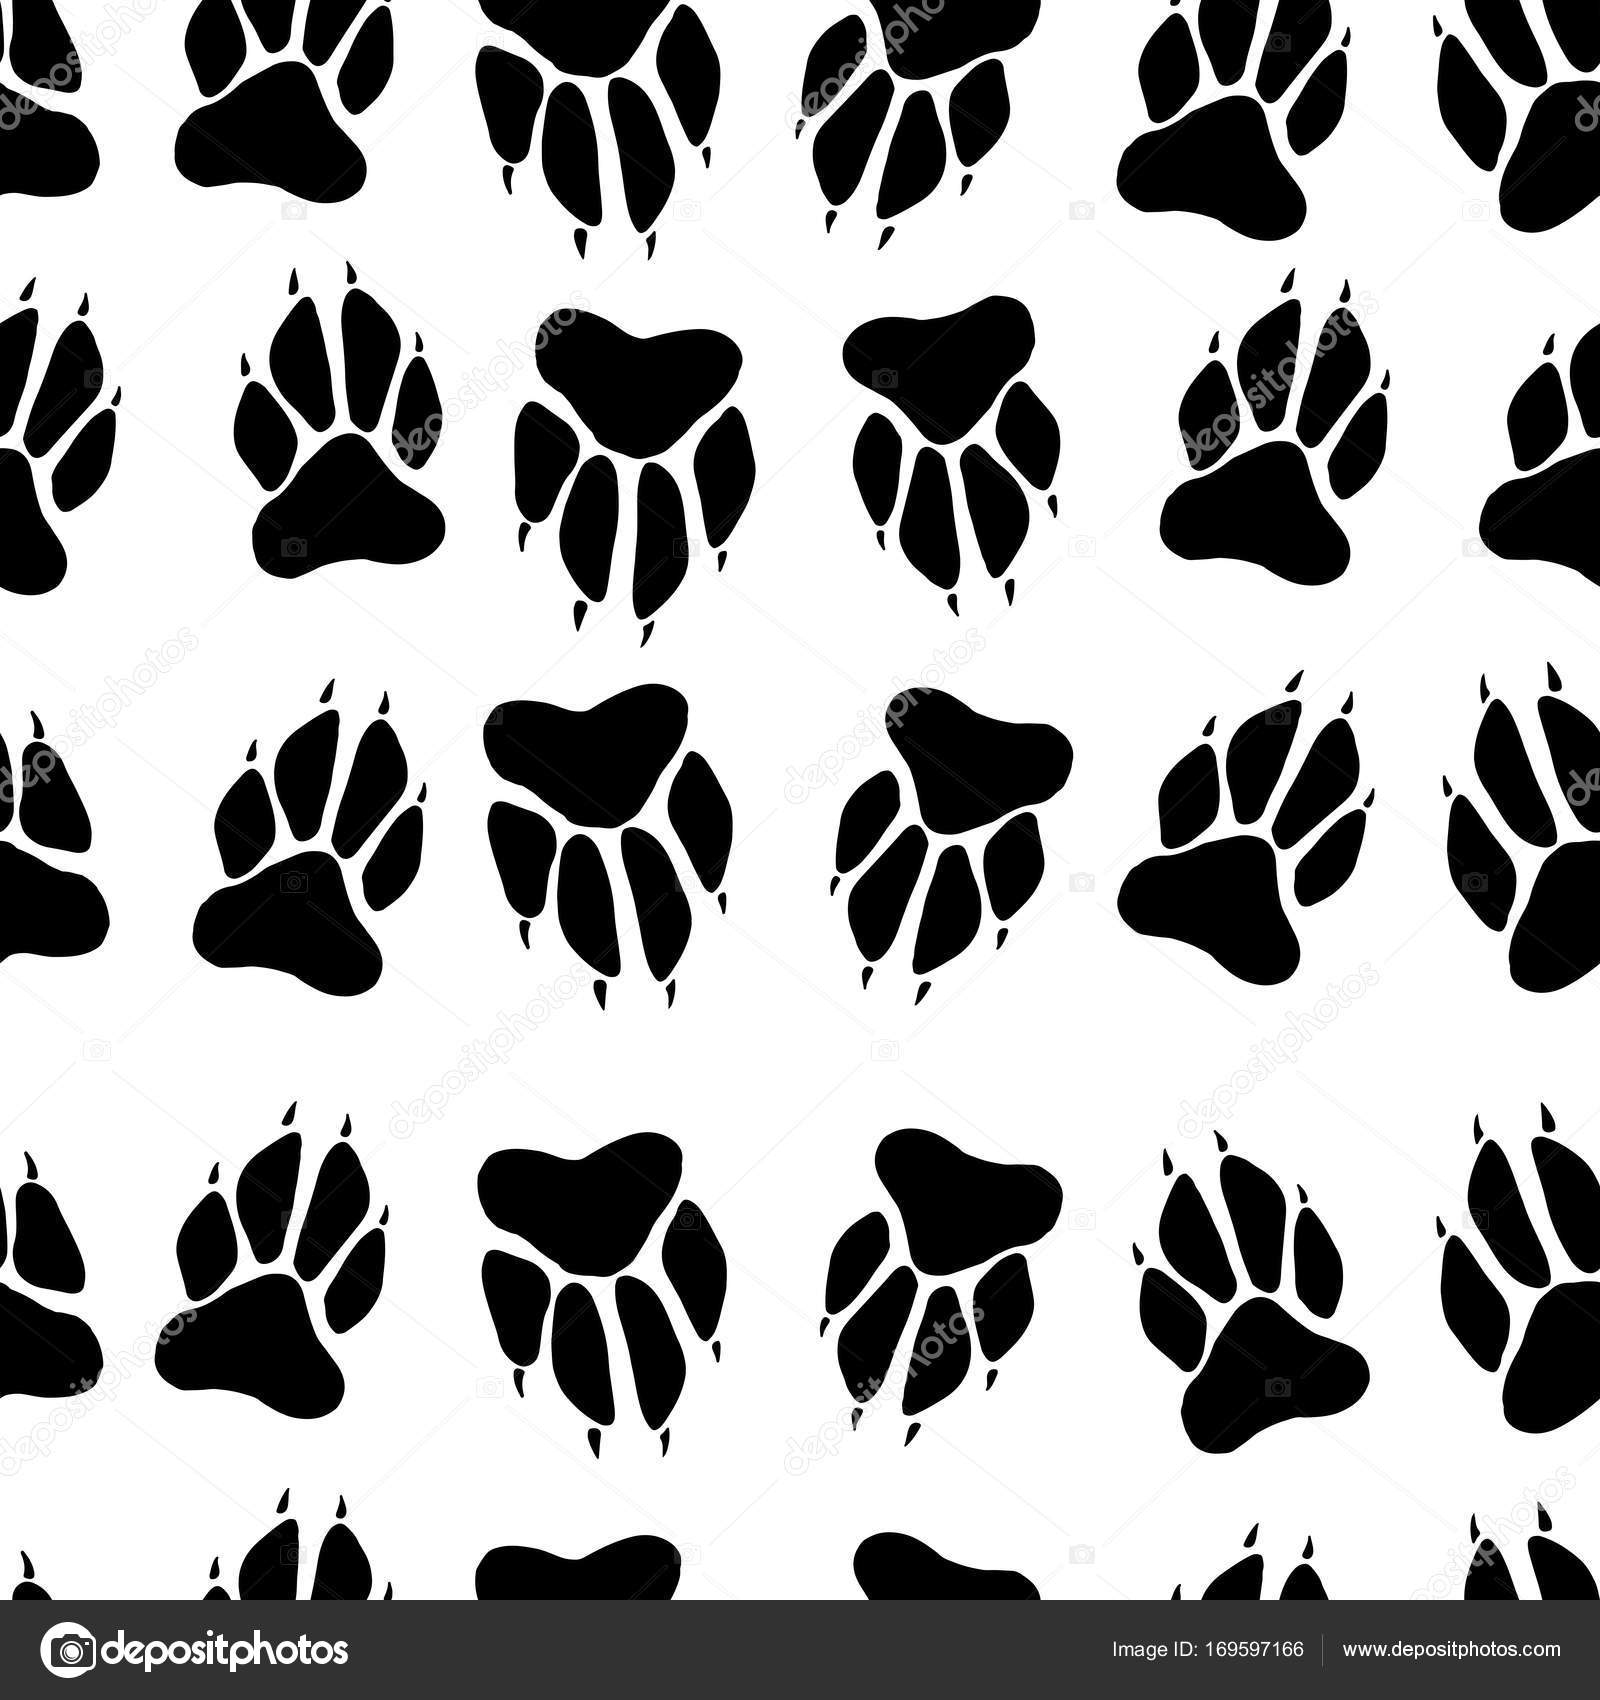 Draw Dog Paw Prints Black White Paw Print Dog Imprint